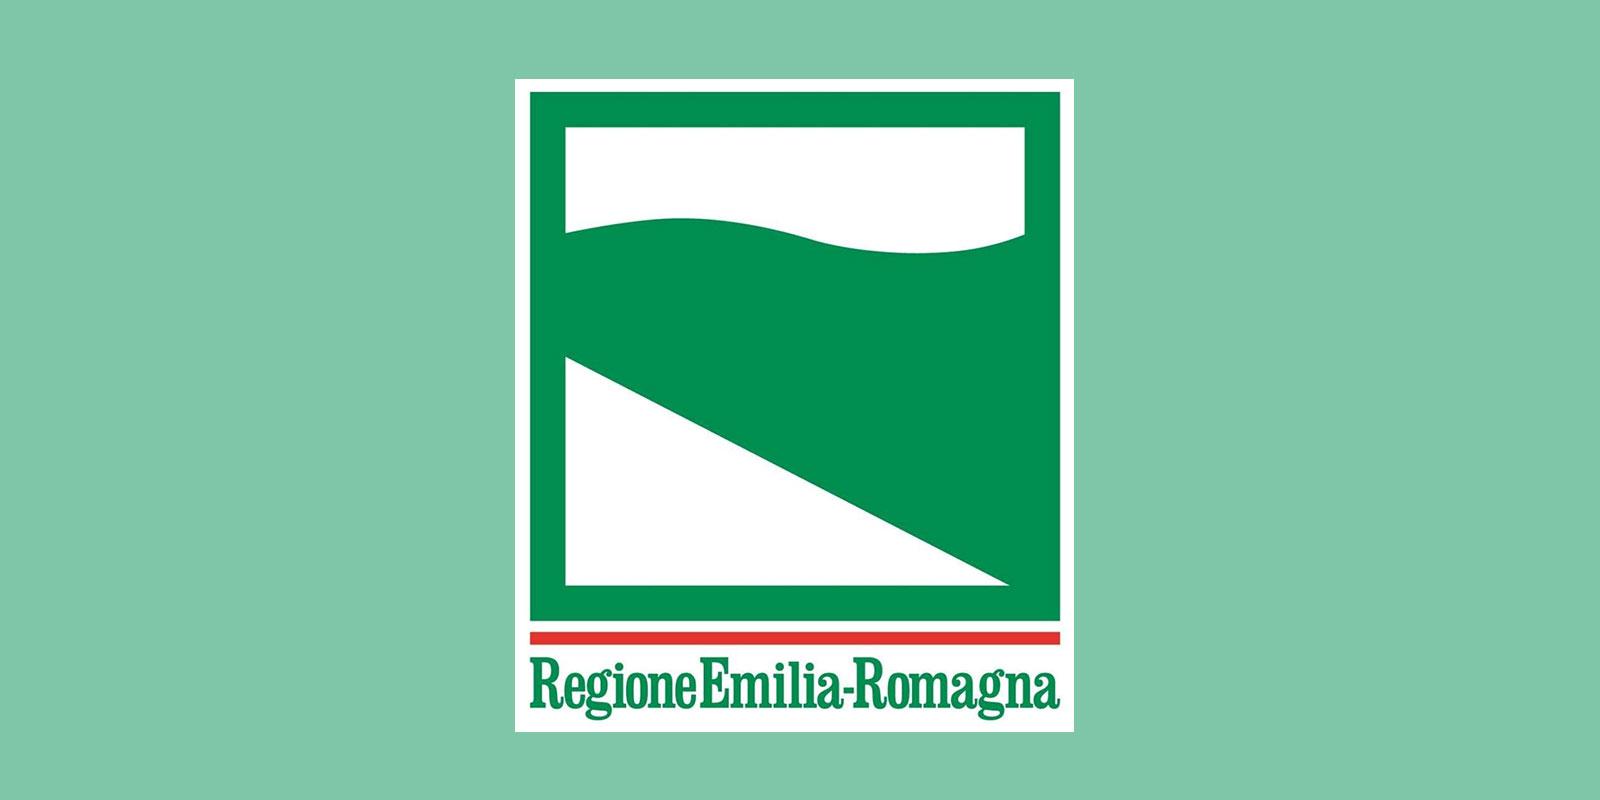 Arredamento Emilia Romagna bando regione emilia romagna per start-up innovative 2018